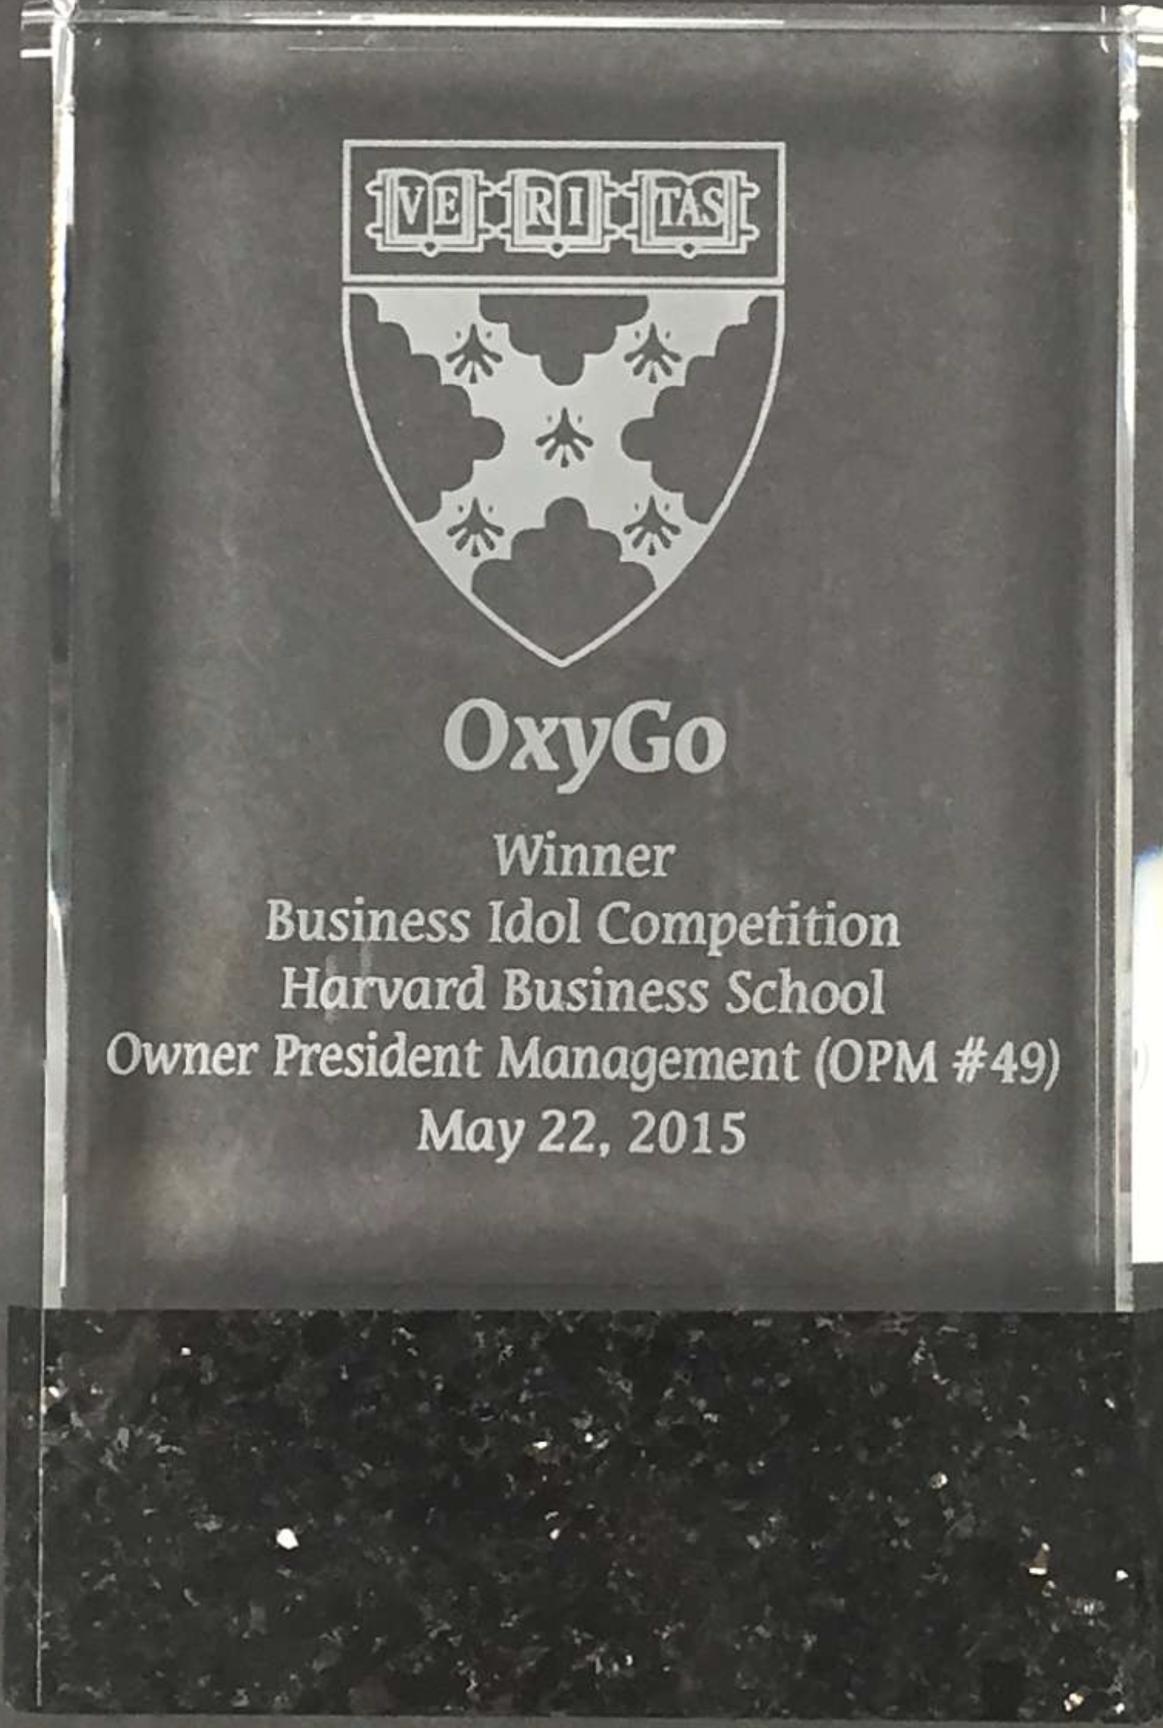 OXYGO PORTABLE OXYGEN CONCENTRATOR WINS HARVARD BUSINESS SCHOOL AWARD